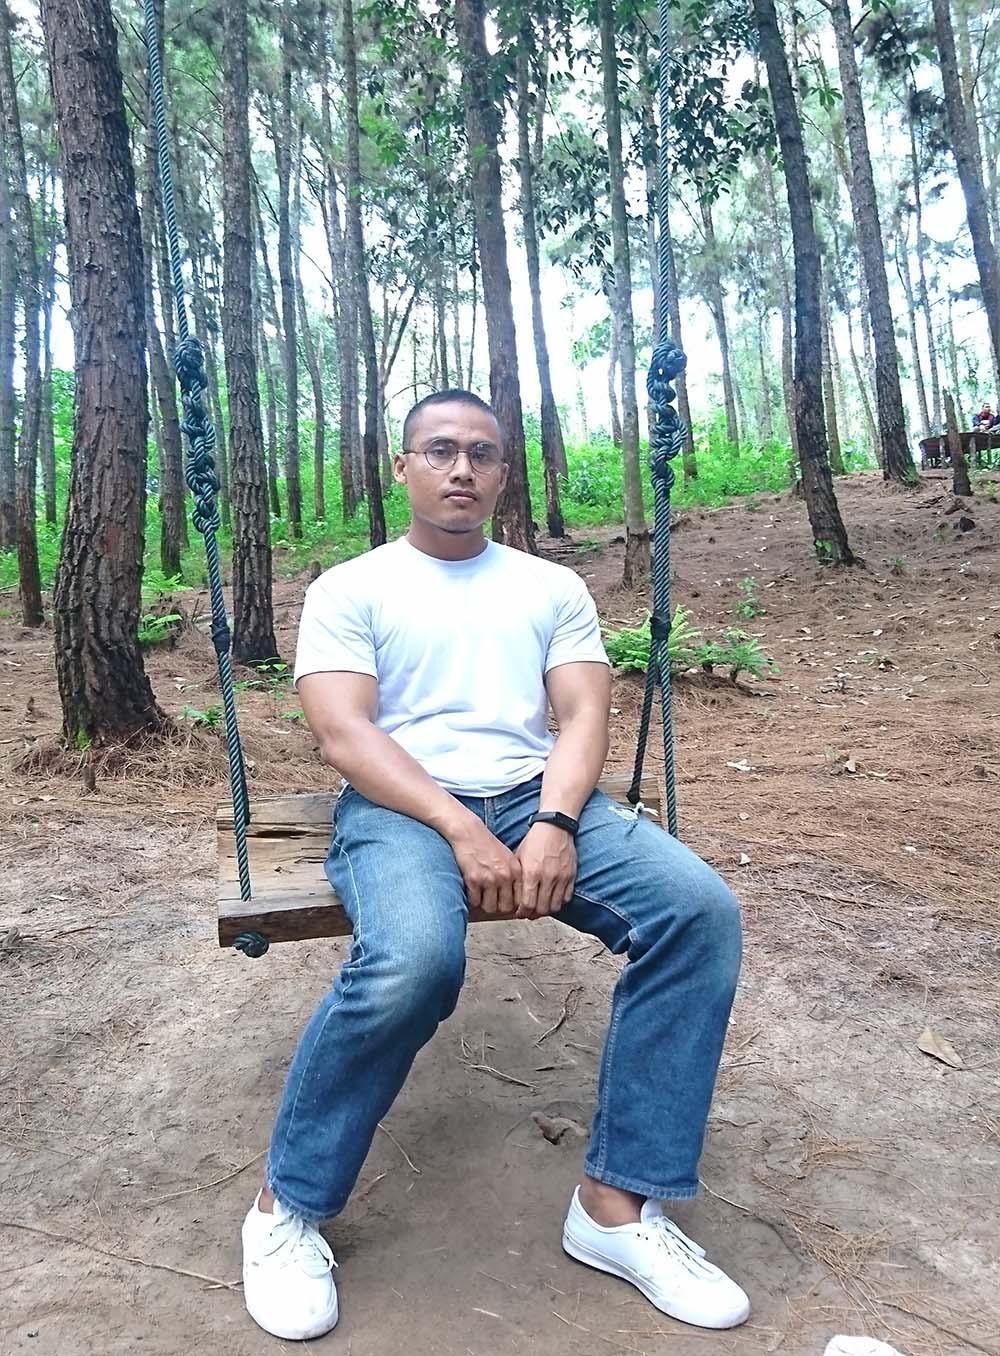 Wisata Hutan Pinus Candika, Tempat Piknik Keluarga dan Foto Prewedding di Kampar, tiket masuk hutan pinus riau